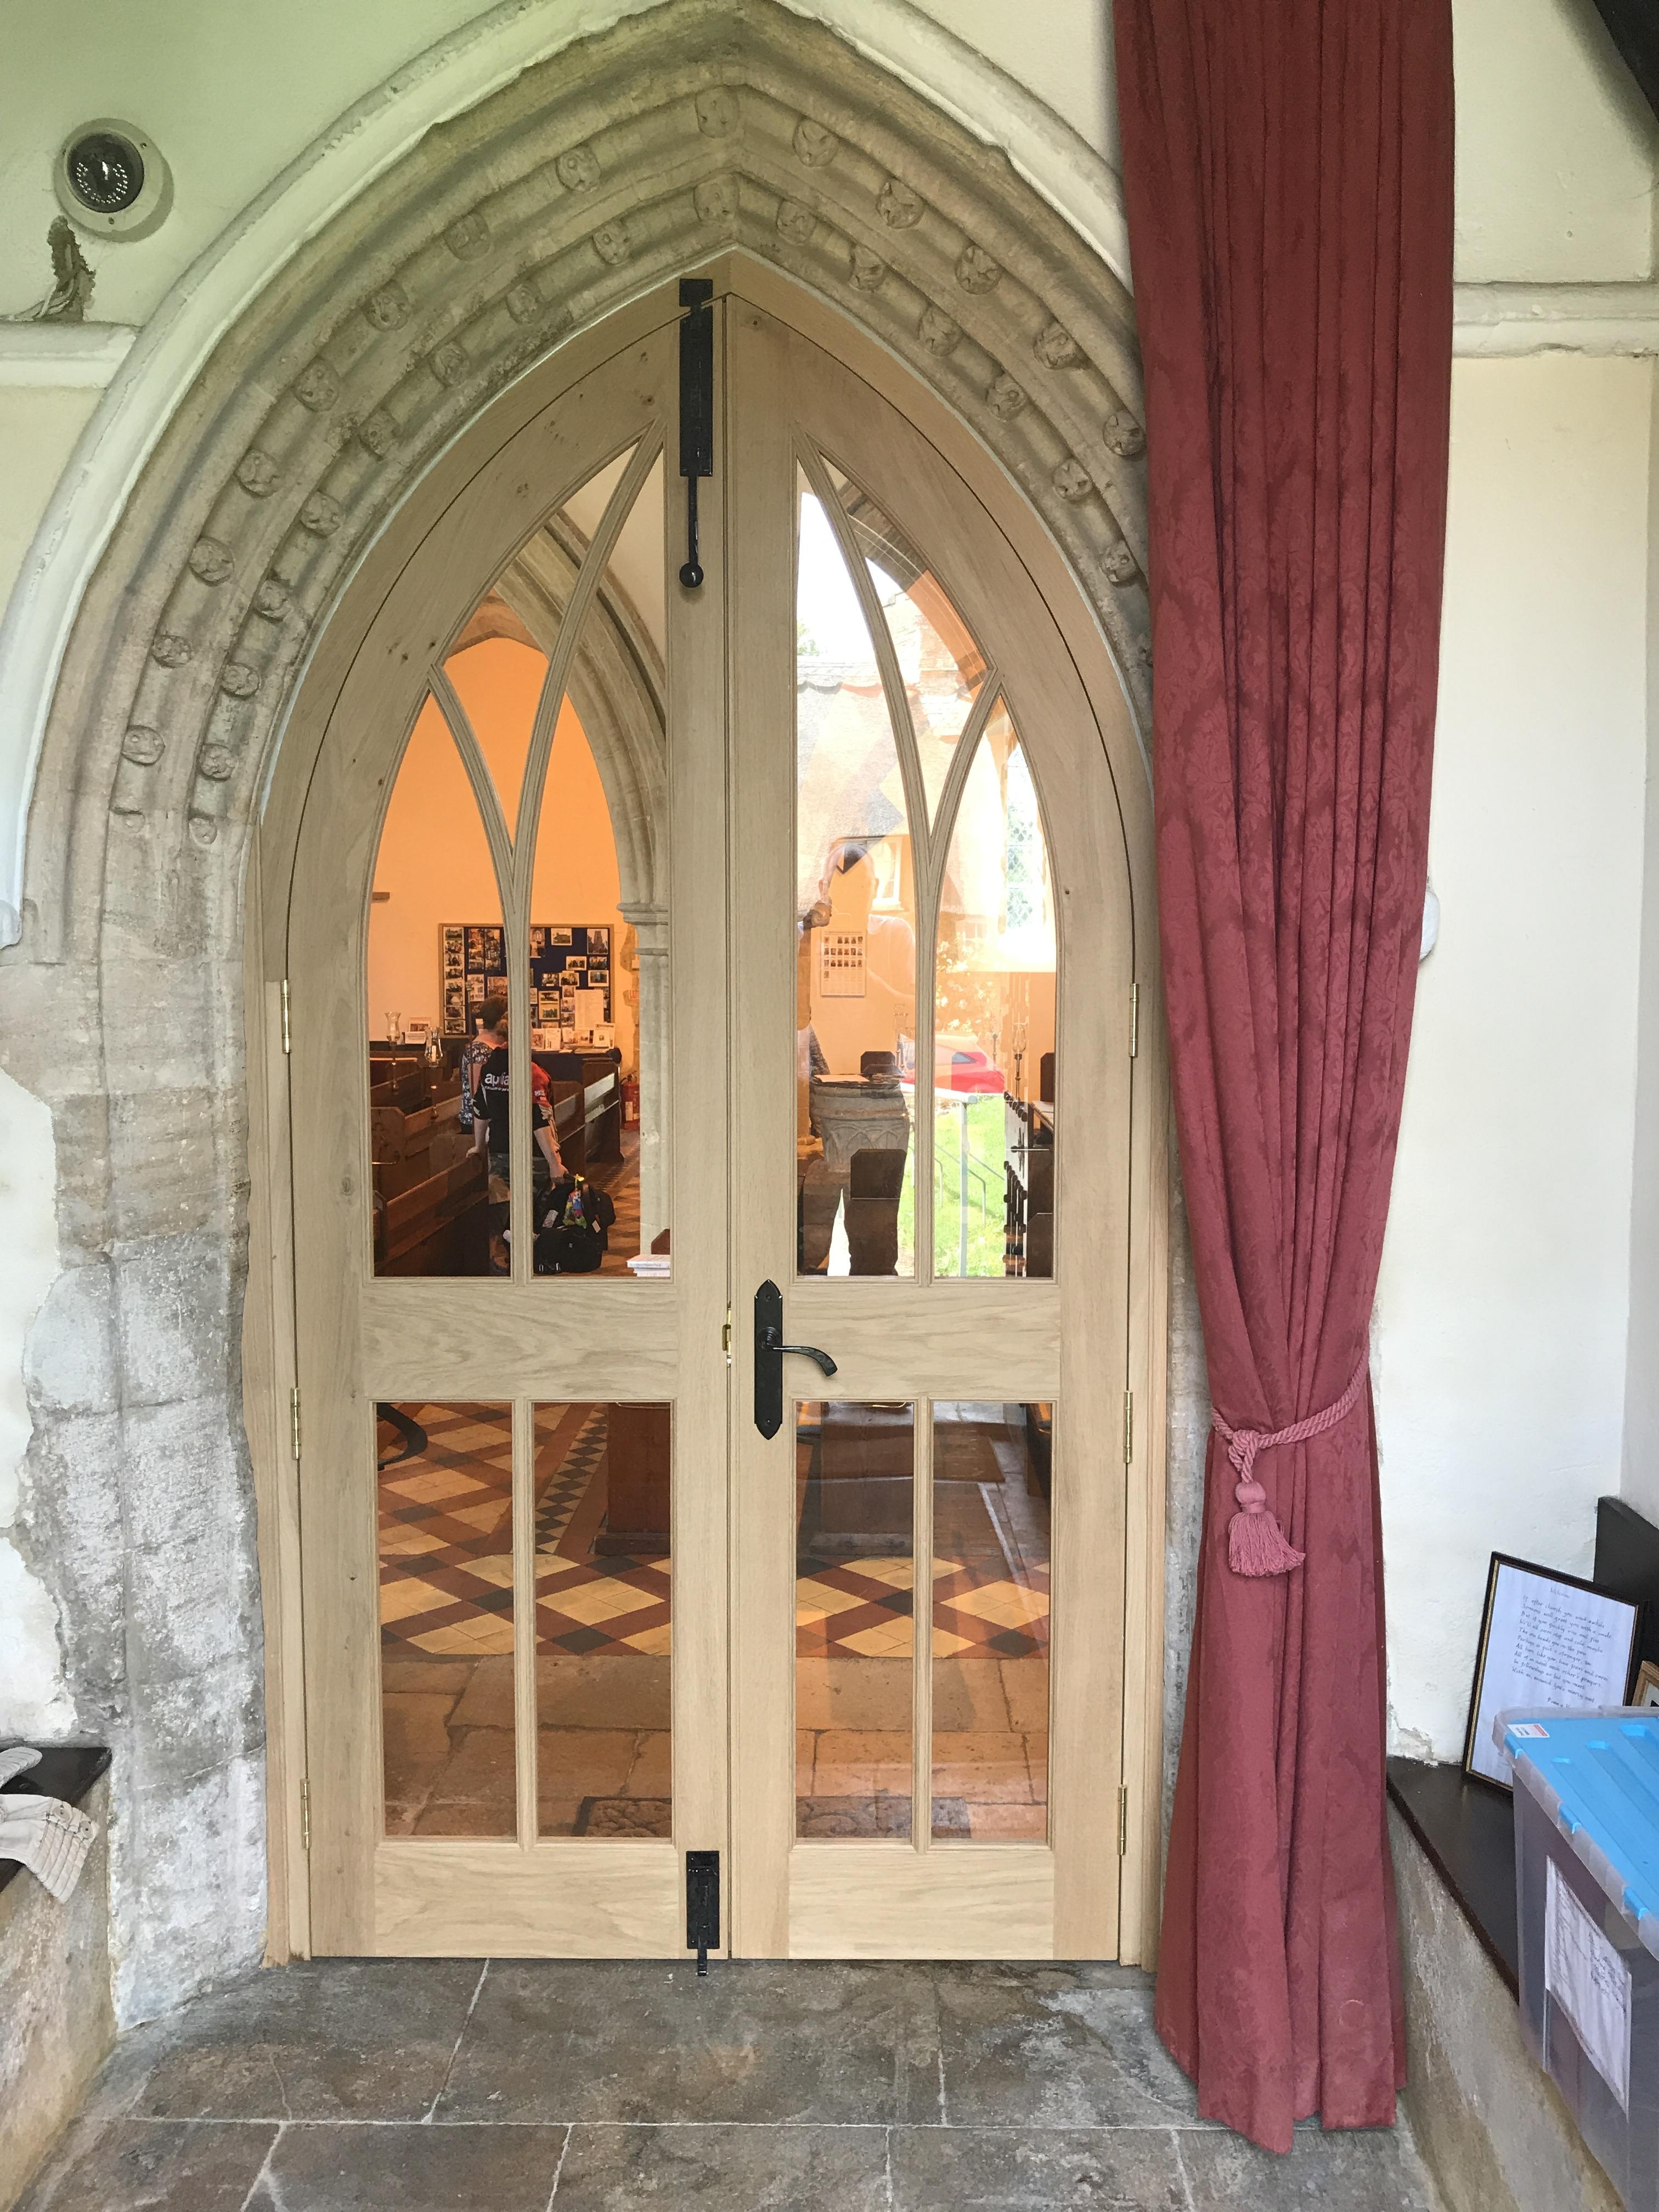 Looking in towards church